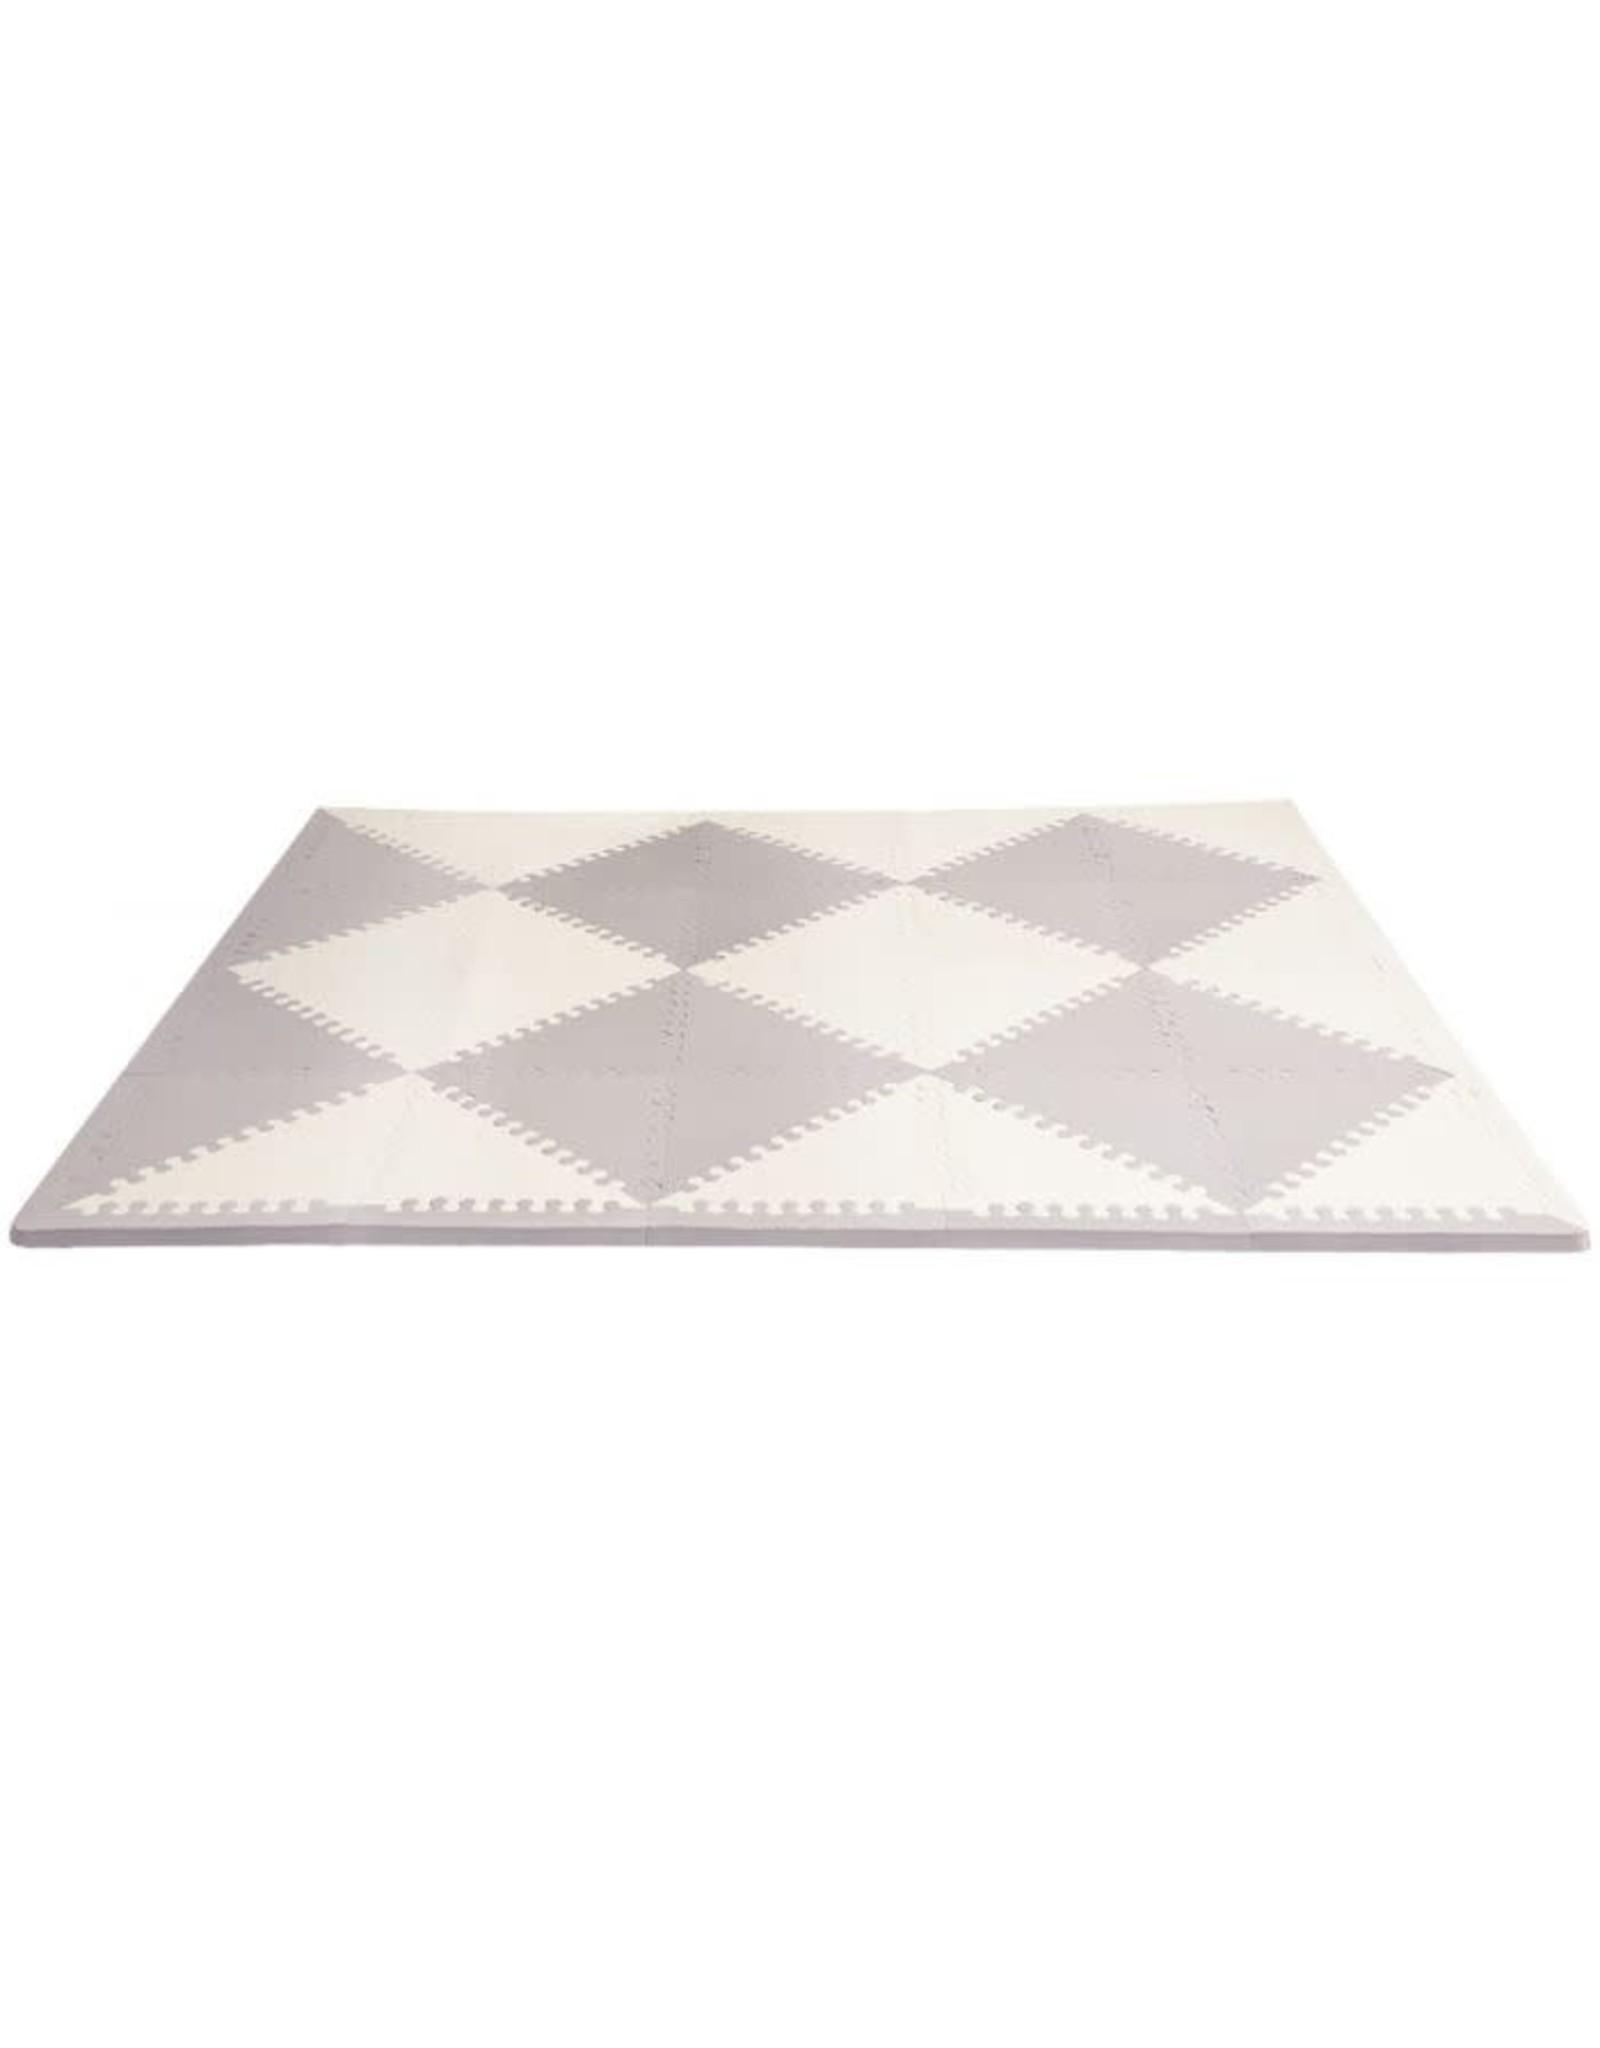 Play Spot Floor Tiles